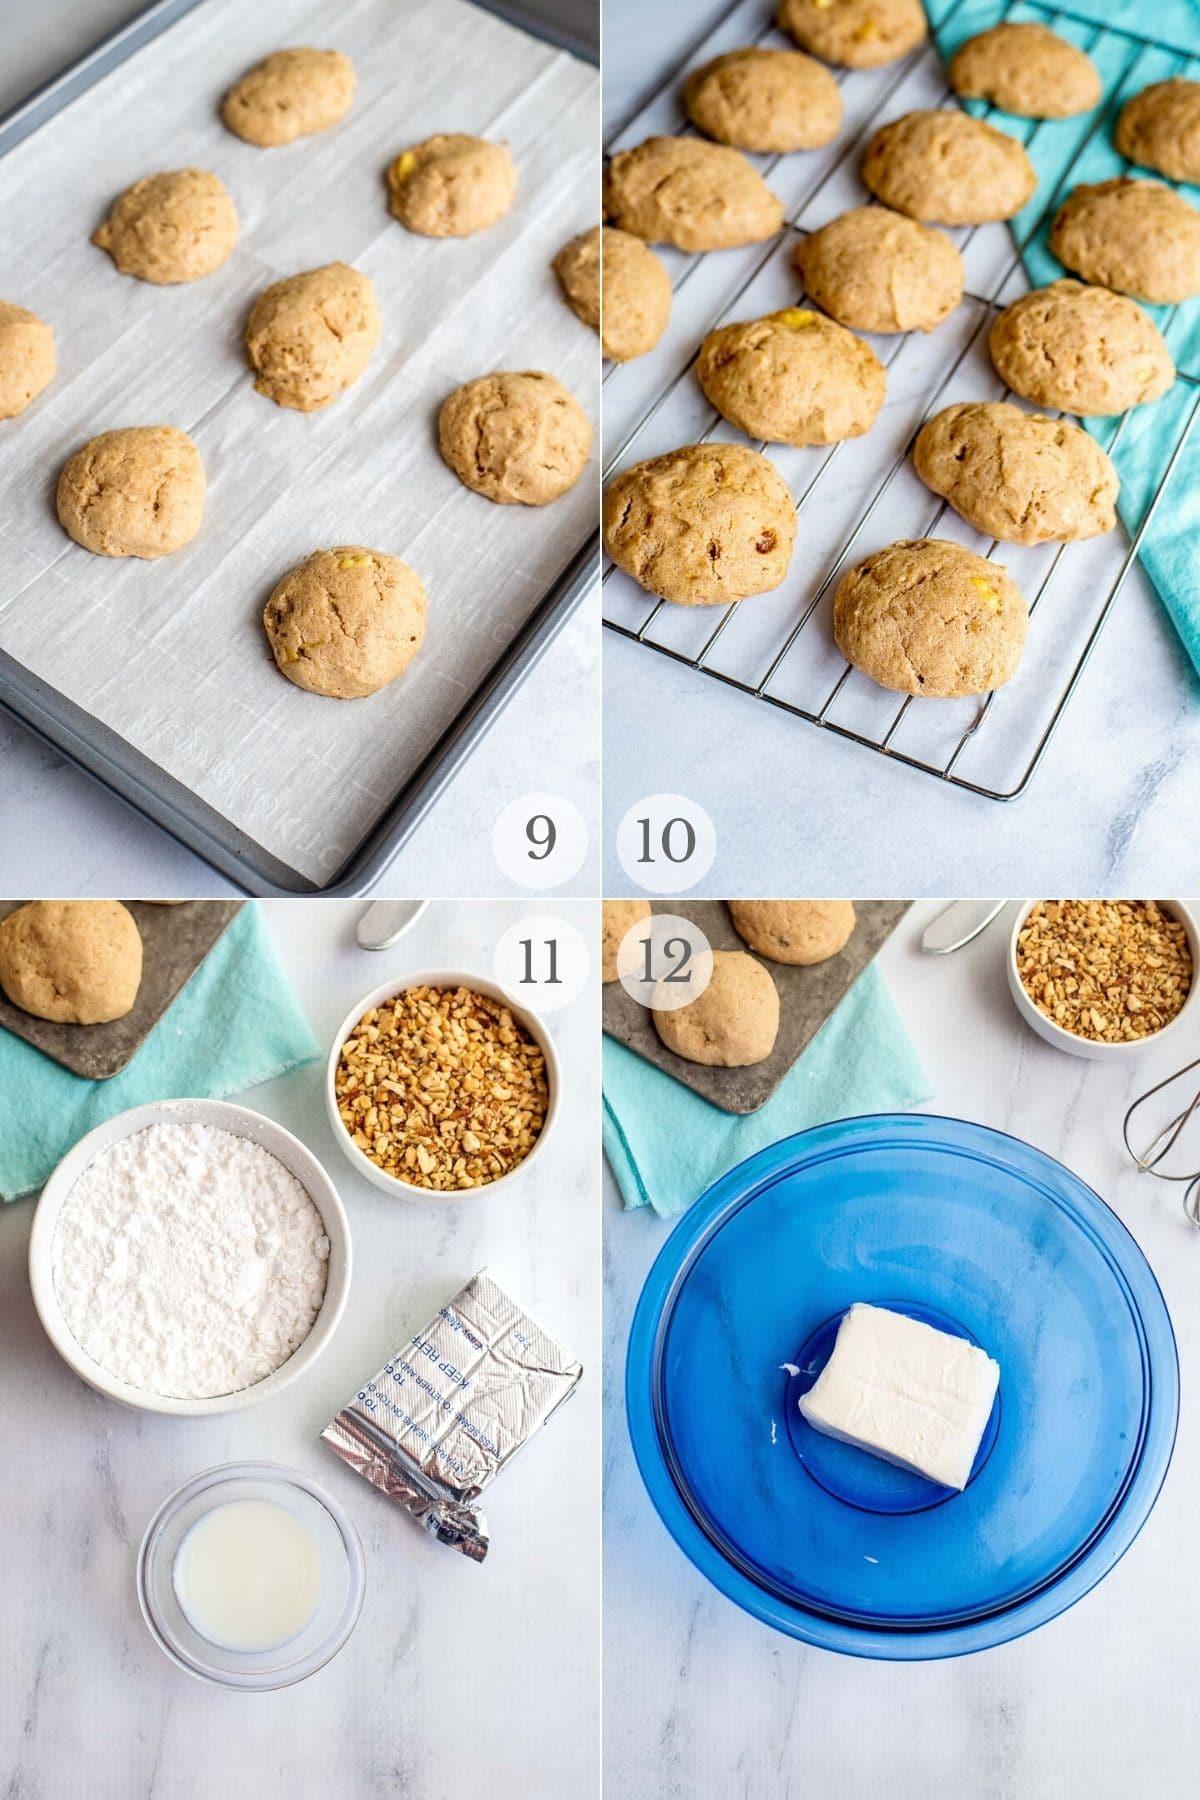 Banana Bread Cookies recipes steps 9-12